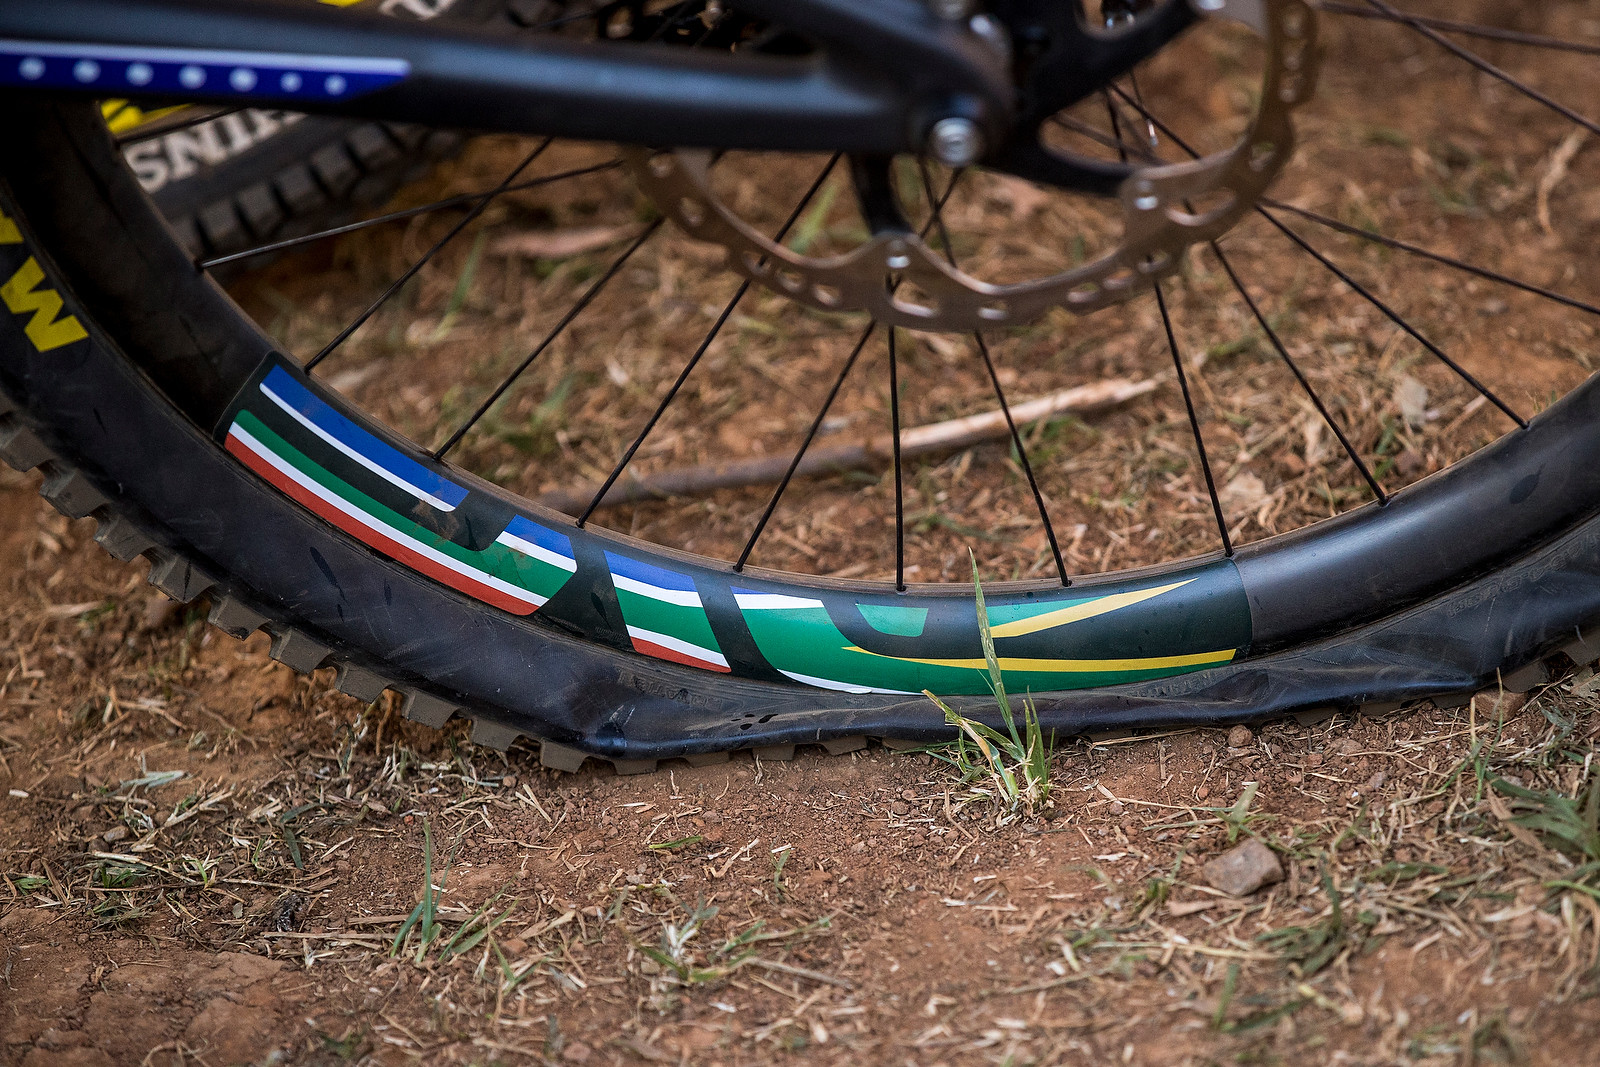 Greg Minnaar's Single Ply Maxxis Rear Tire After Crossing the Finish at World Champs - WINNING BIKE: Greg Minnaar's World Champs Santa Cruz V10c - Mountain Biking Pictures - Vital MTB